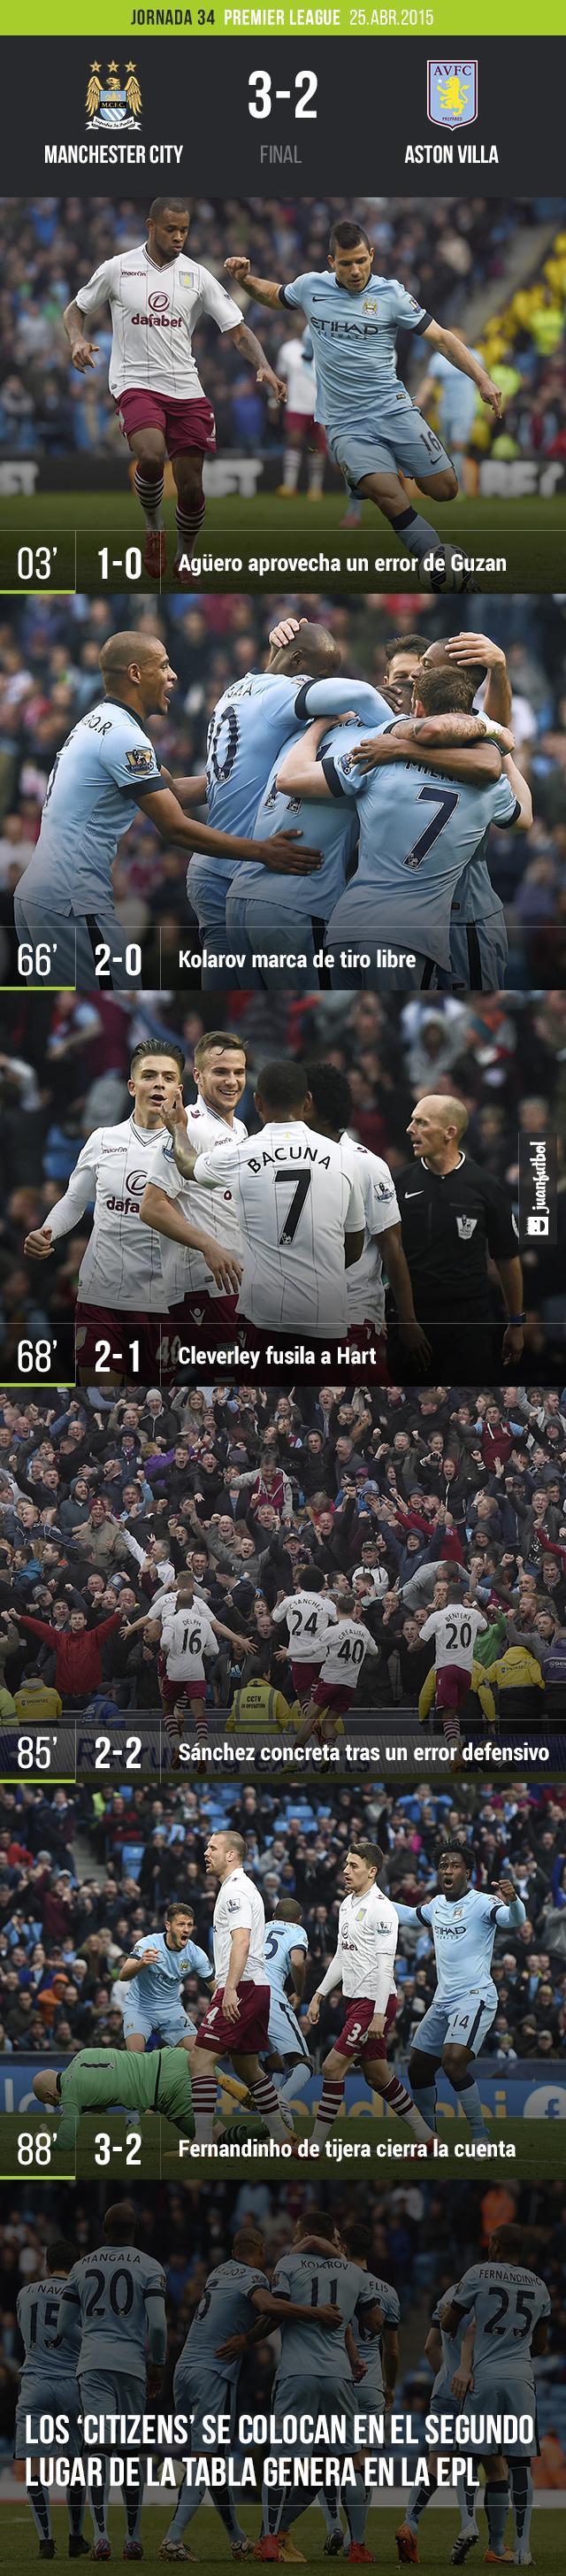 Manchester City sufre pero vence 3-2 al Aston Villa en la jornada 34 de la Premier League